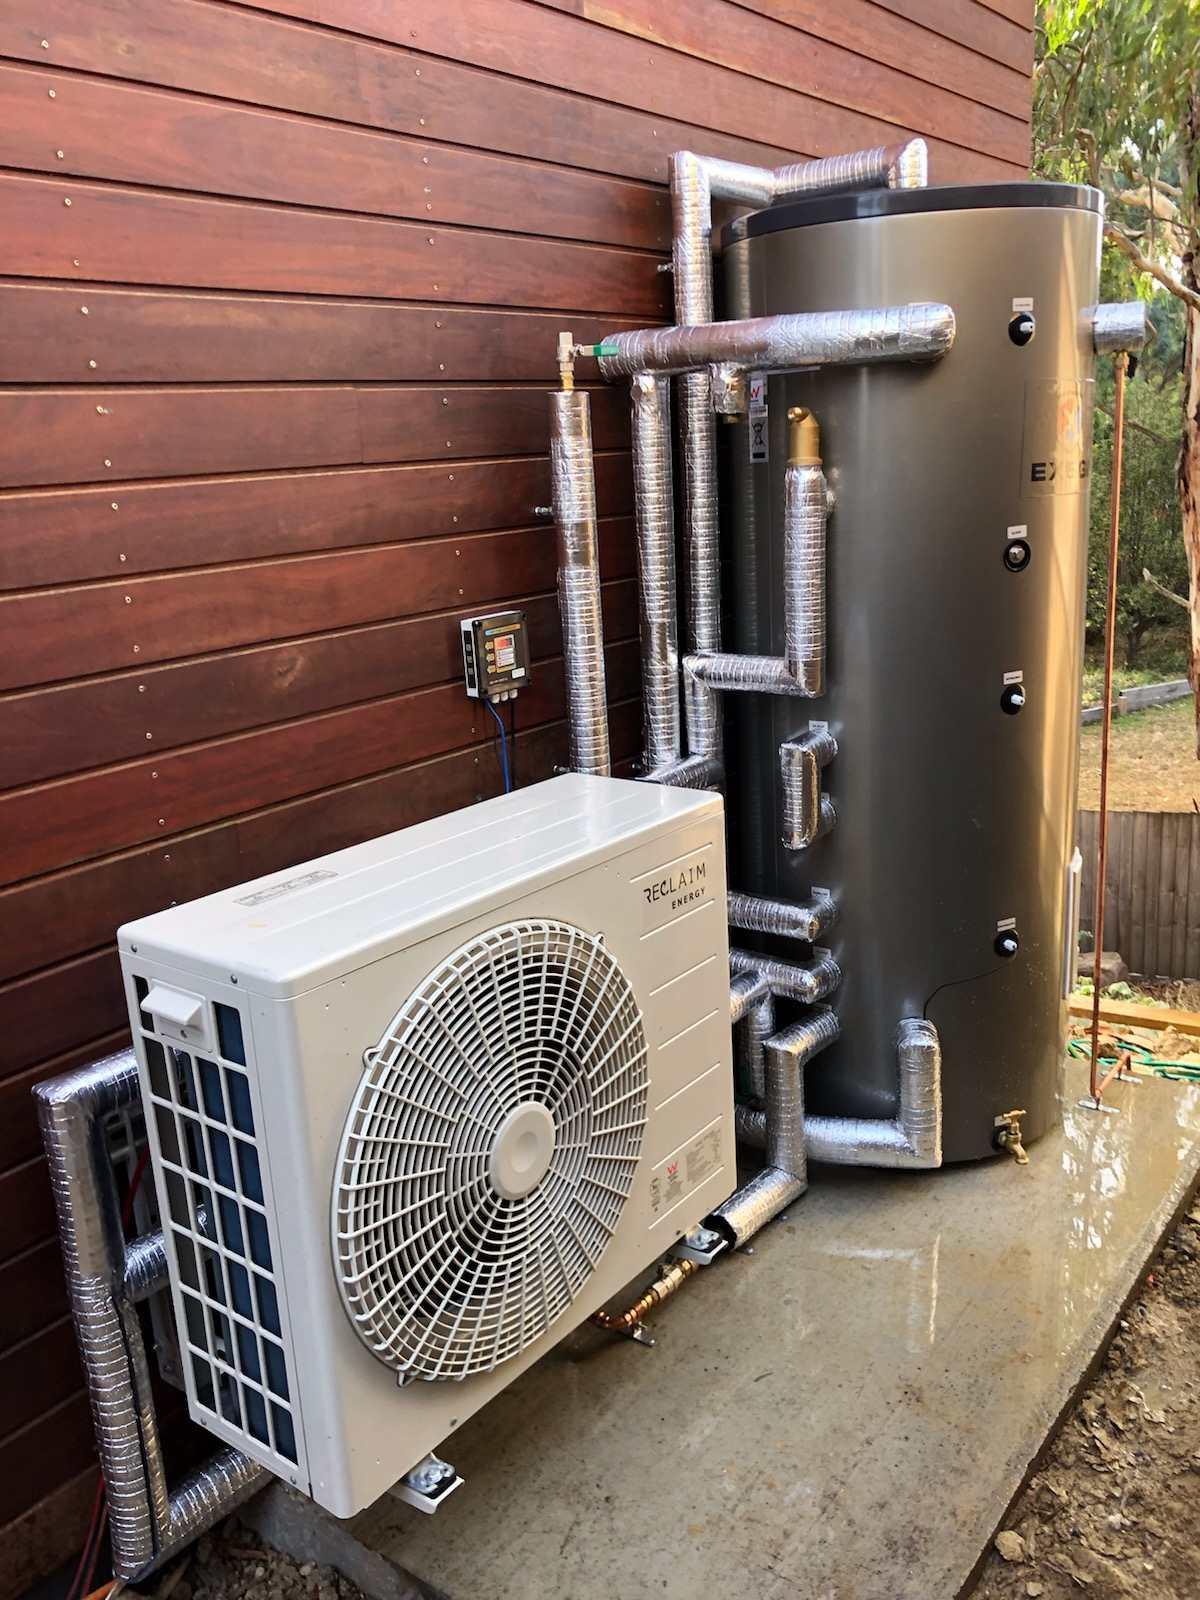 Exegi tank showing professional pipe insulation